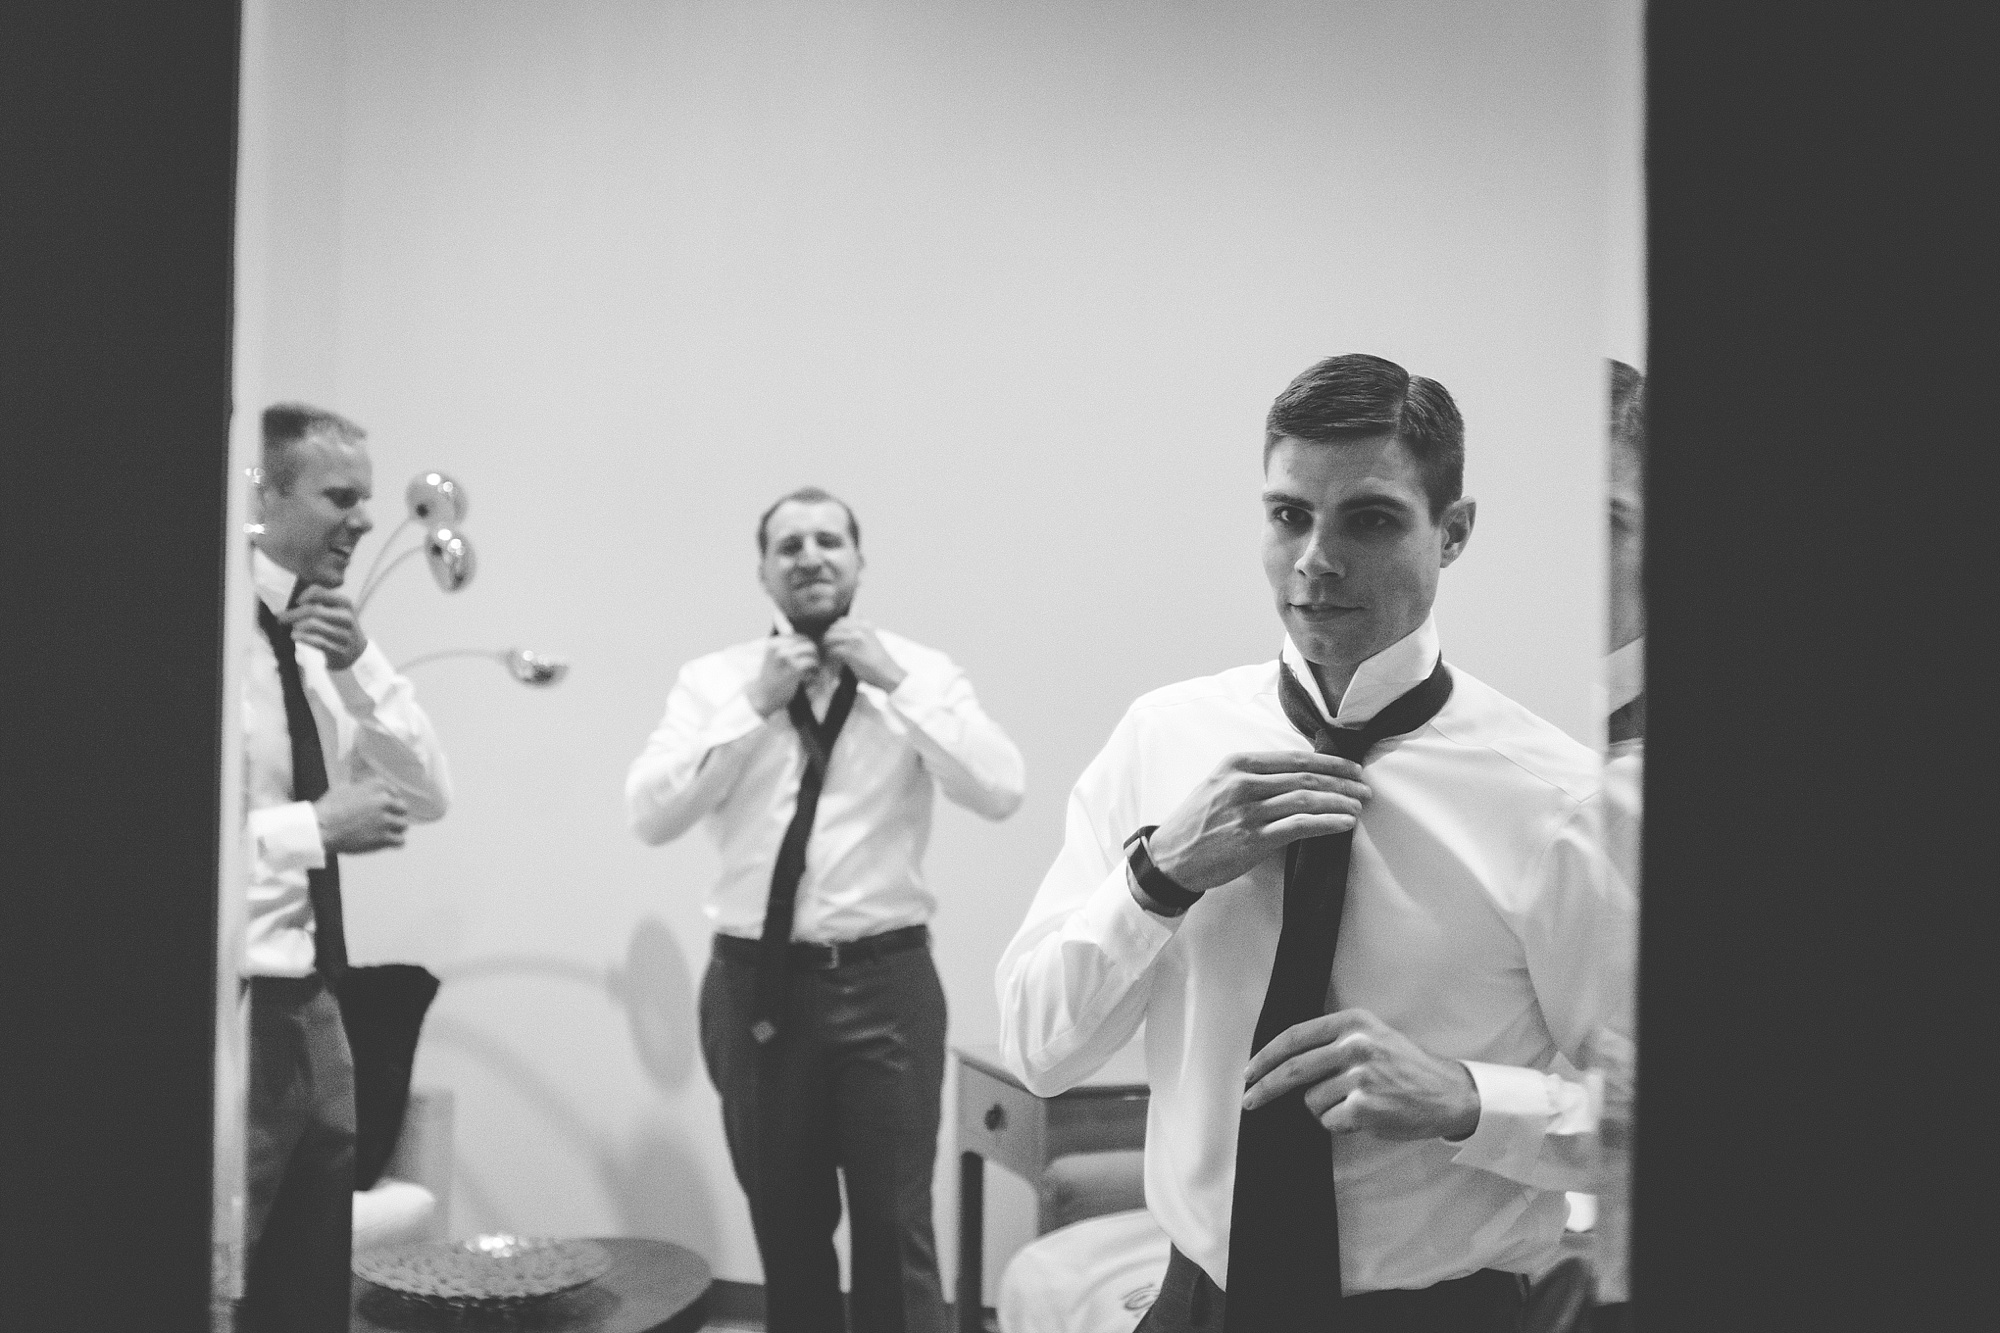 Brandon_Shafer_Photography_Lauren_Ethan_New_Vintage_Place_Grand_Rapids_Wedding_0011.jpg